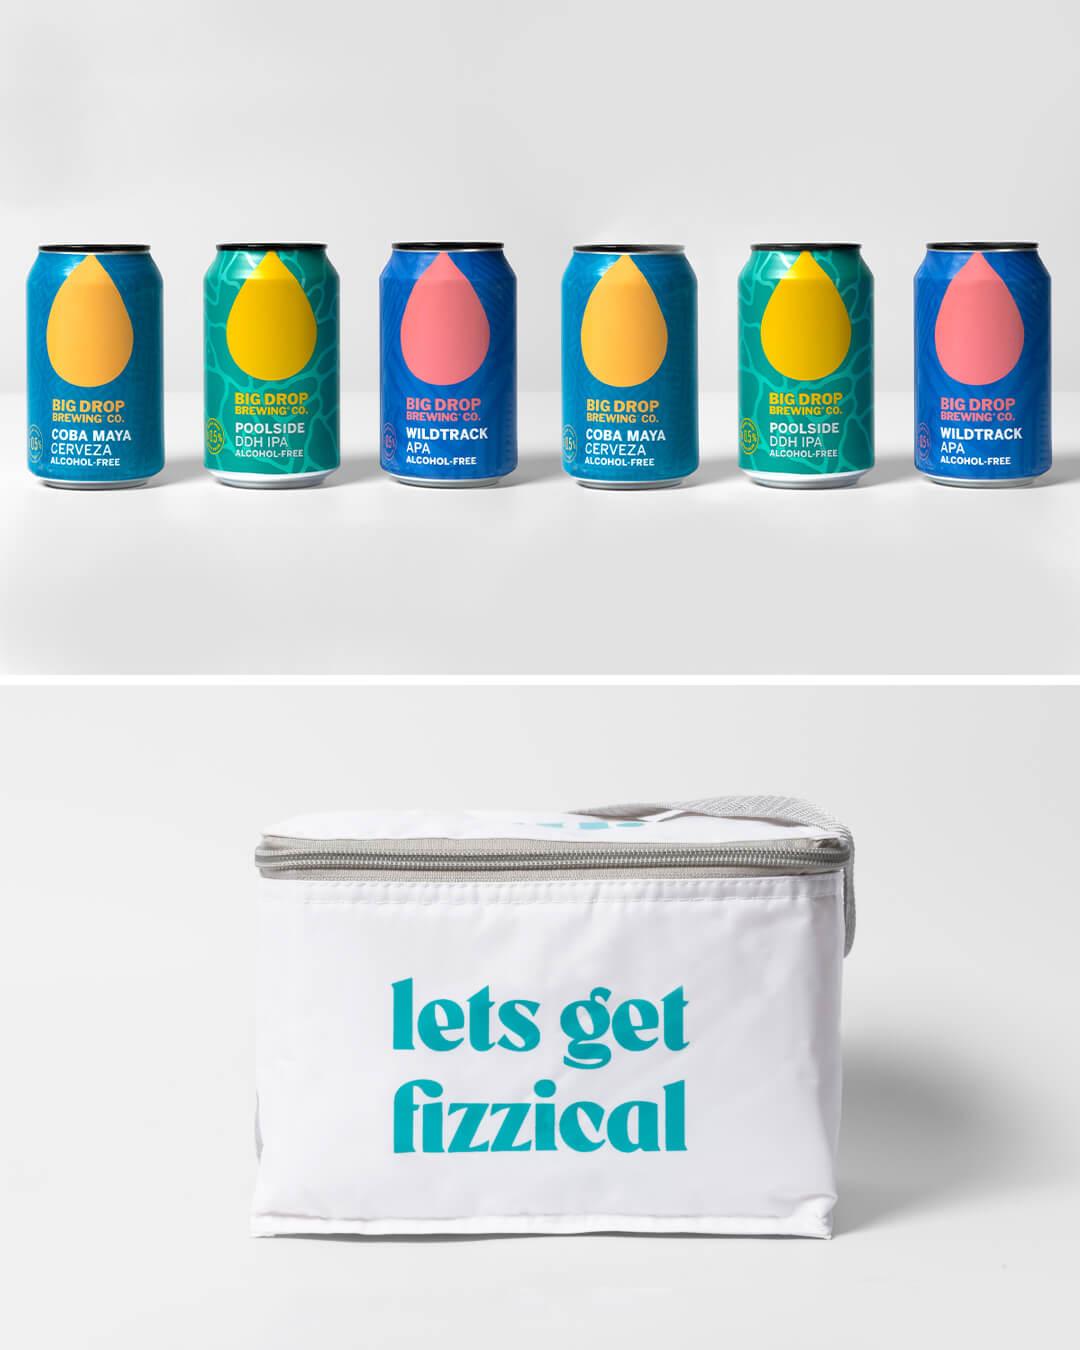 Big Drop Summer alcohol free craft beer cans & ta. cool bag